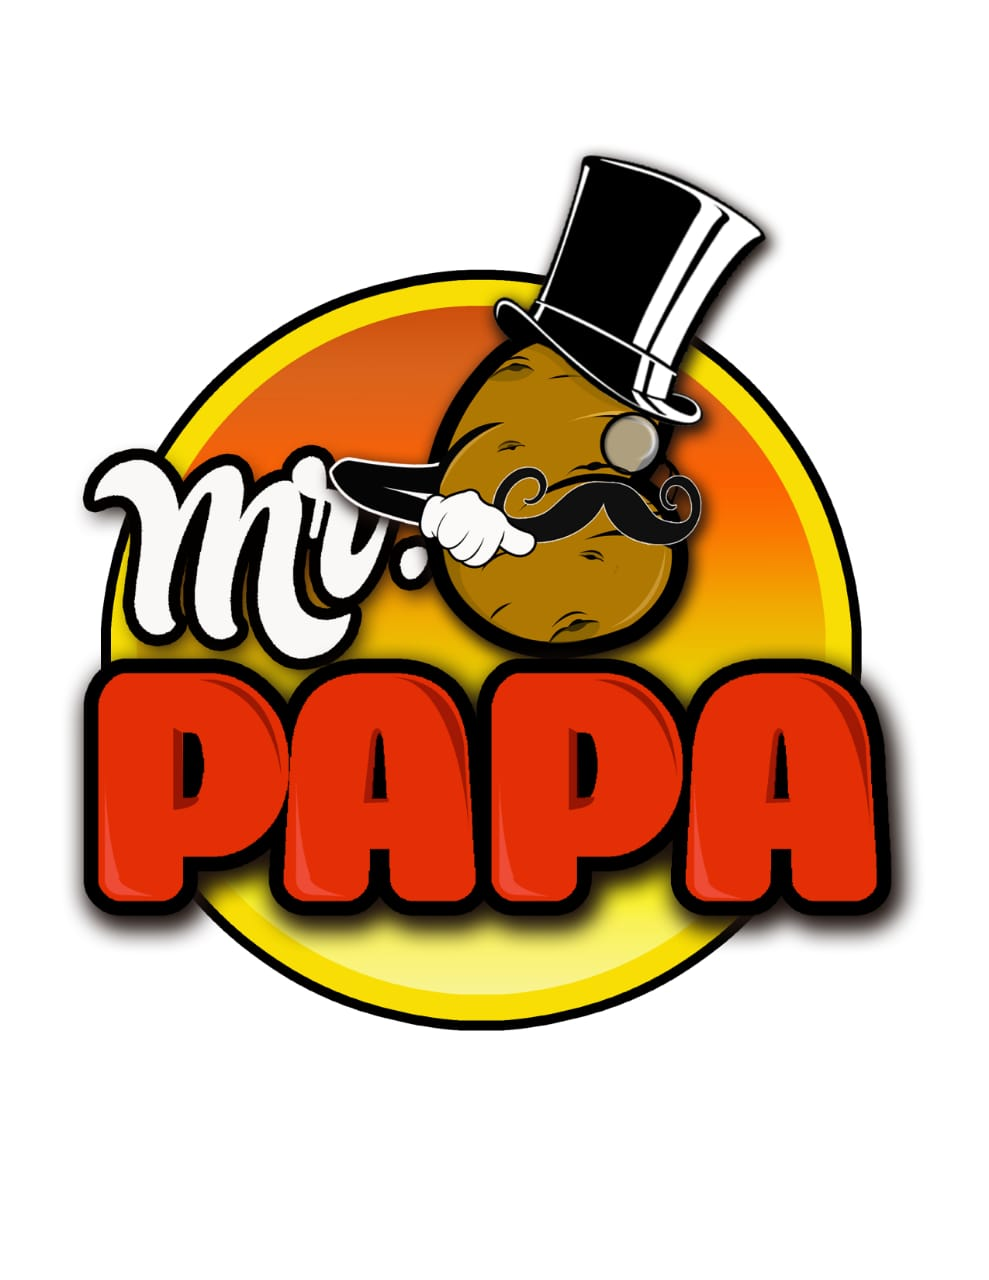 Mr Papa Cali